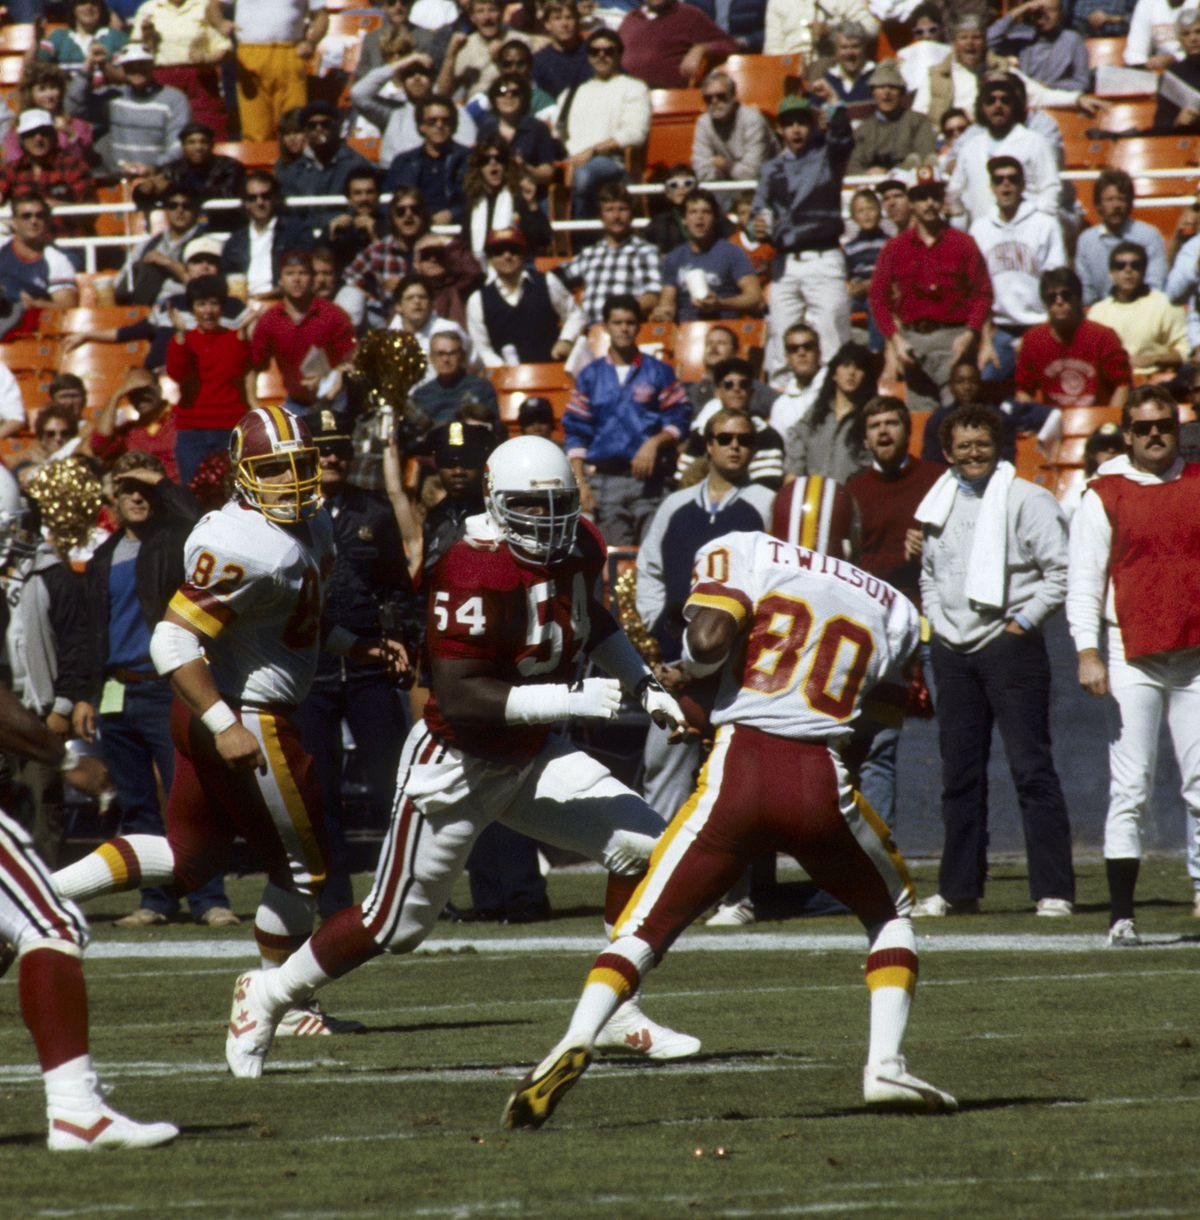 St. Louis Cardinals vs Washington Redskins - October 4, 1987